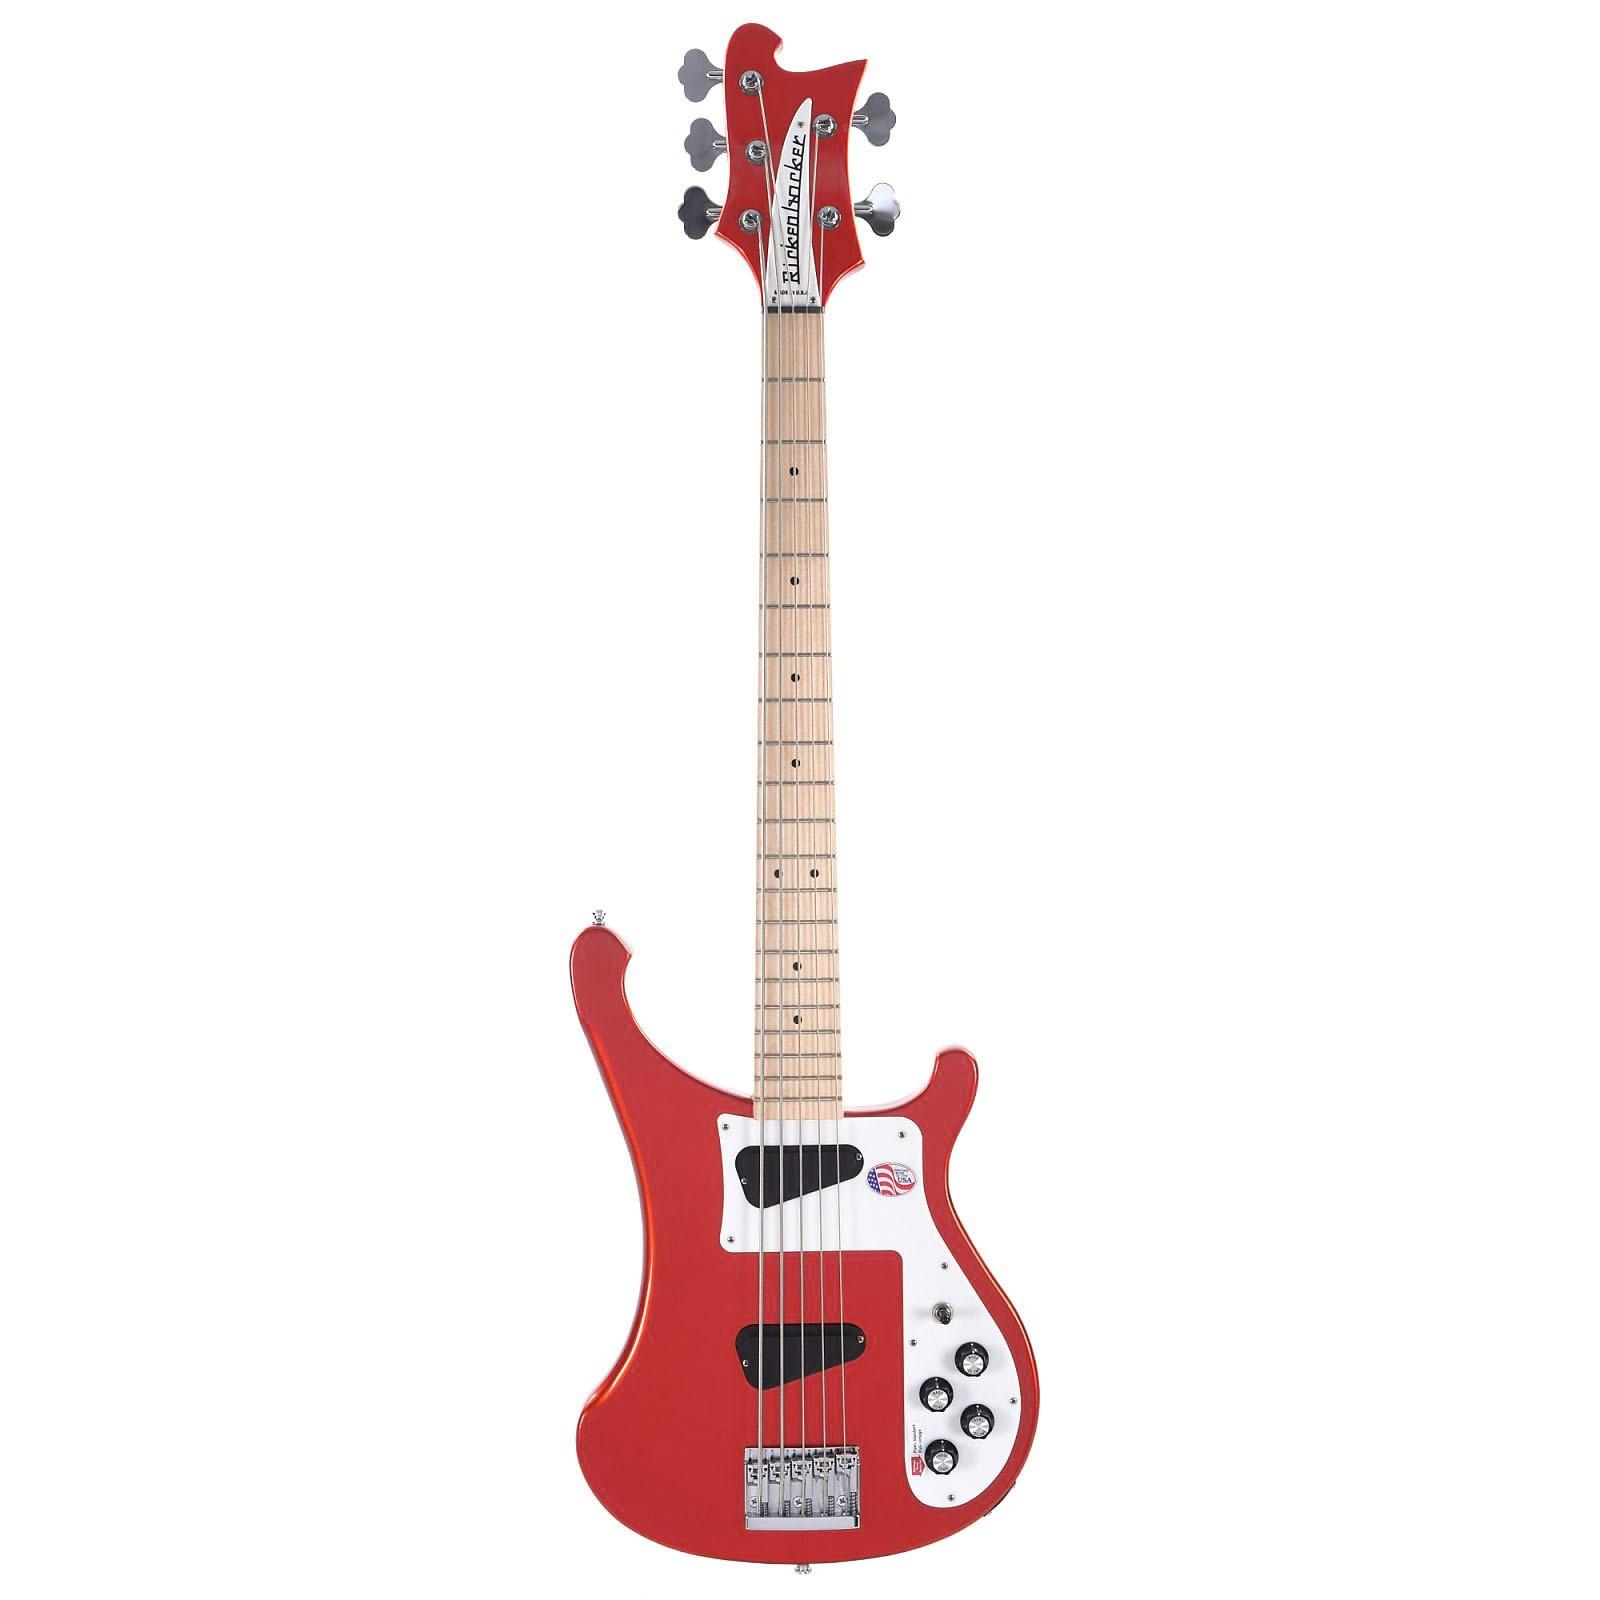 Rickenbacker 4003S5 5-String Bass - Limited Edition Pillar Box Red